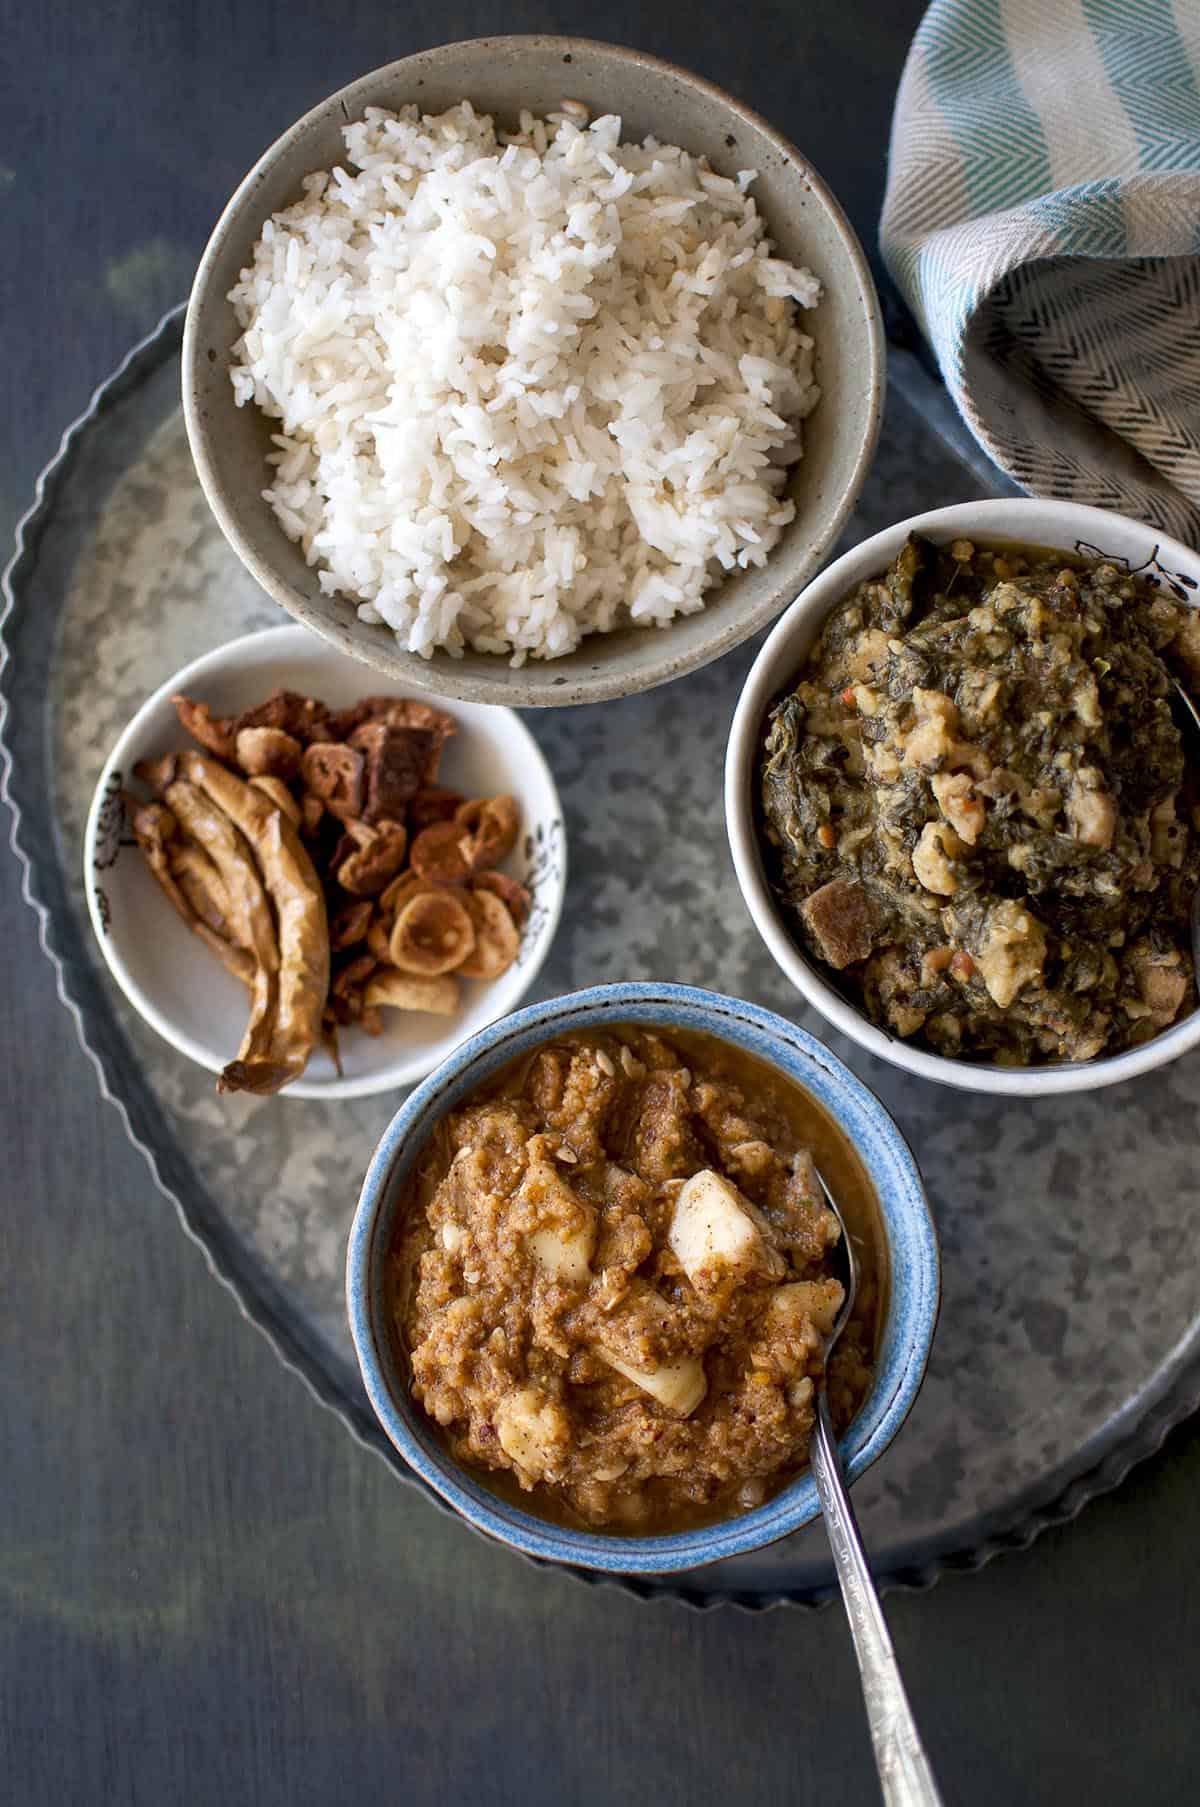 Tray with Andhra meal with bowls of chutney, bachali koora, rice and vadiyalu